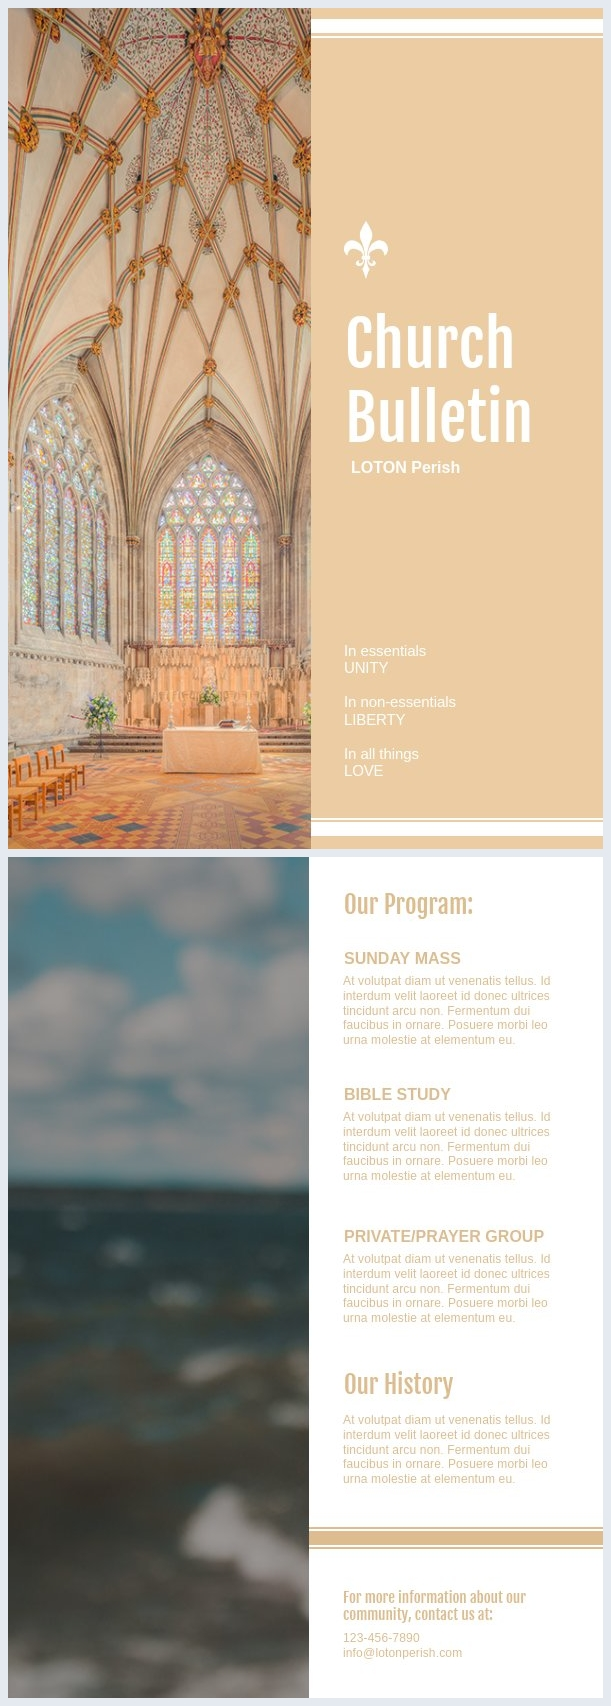 Church Bulletin Template & Design